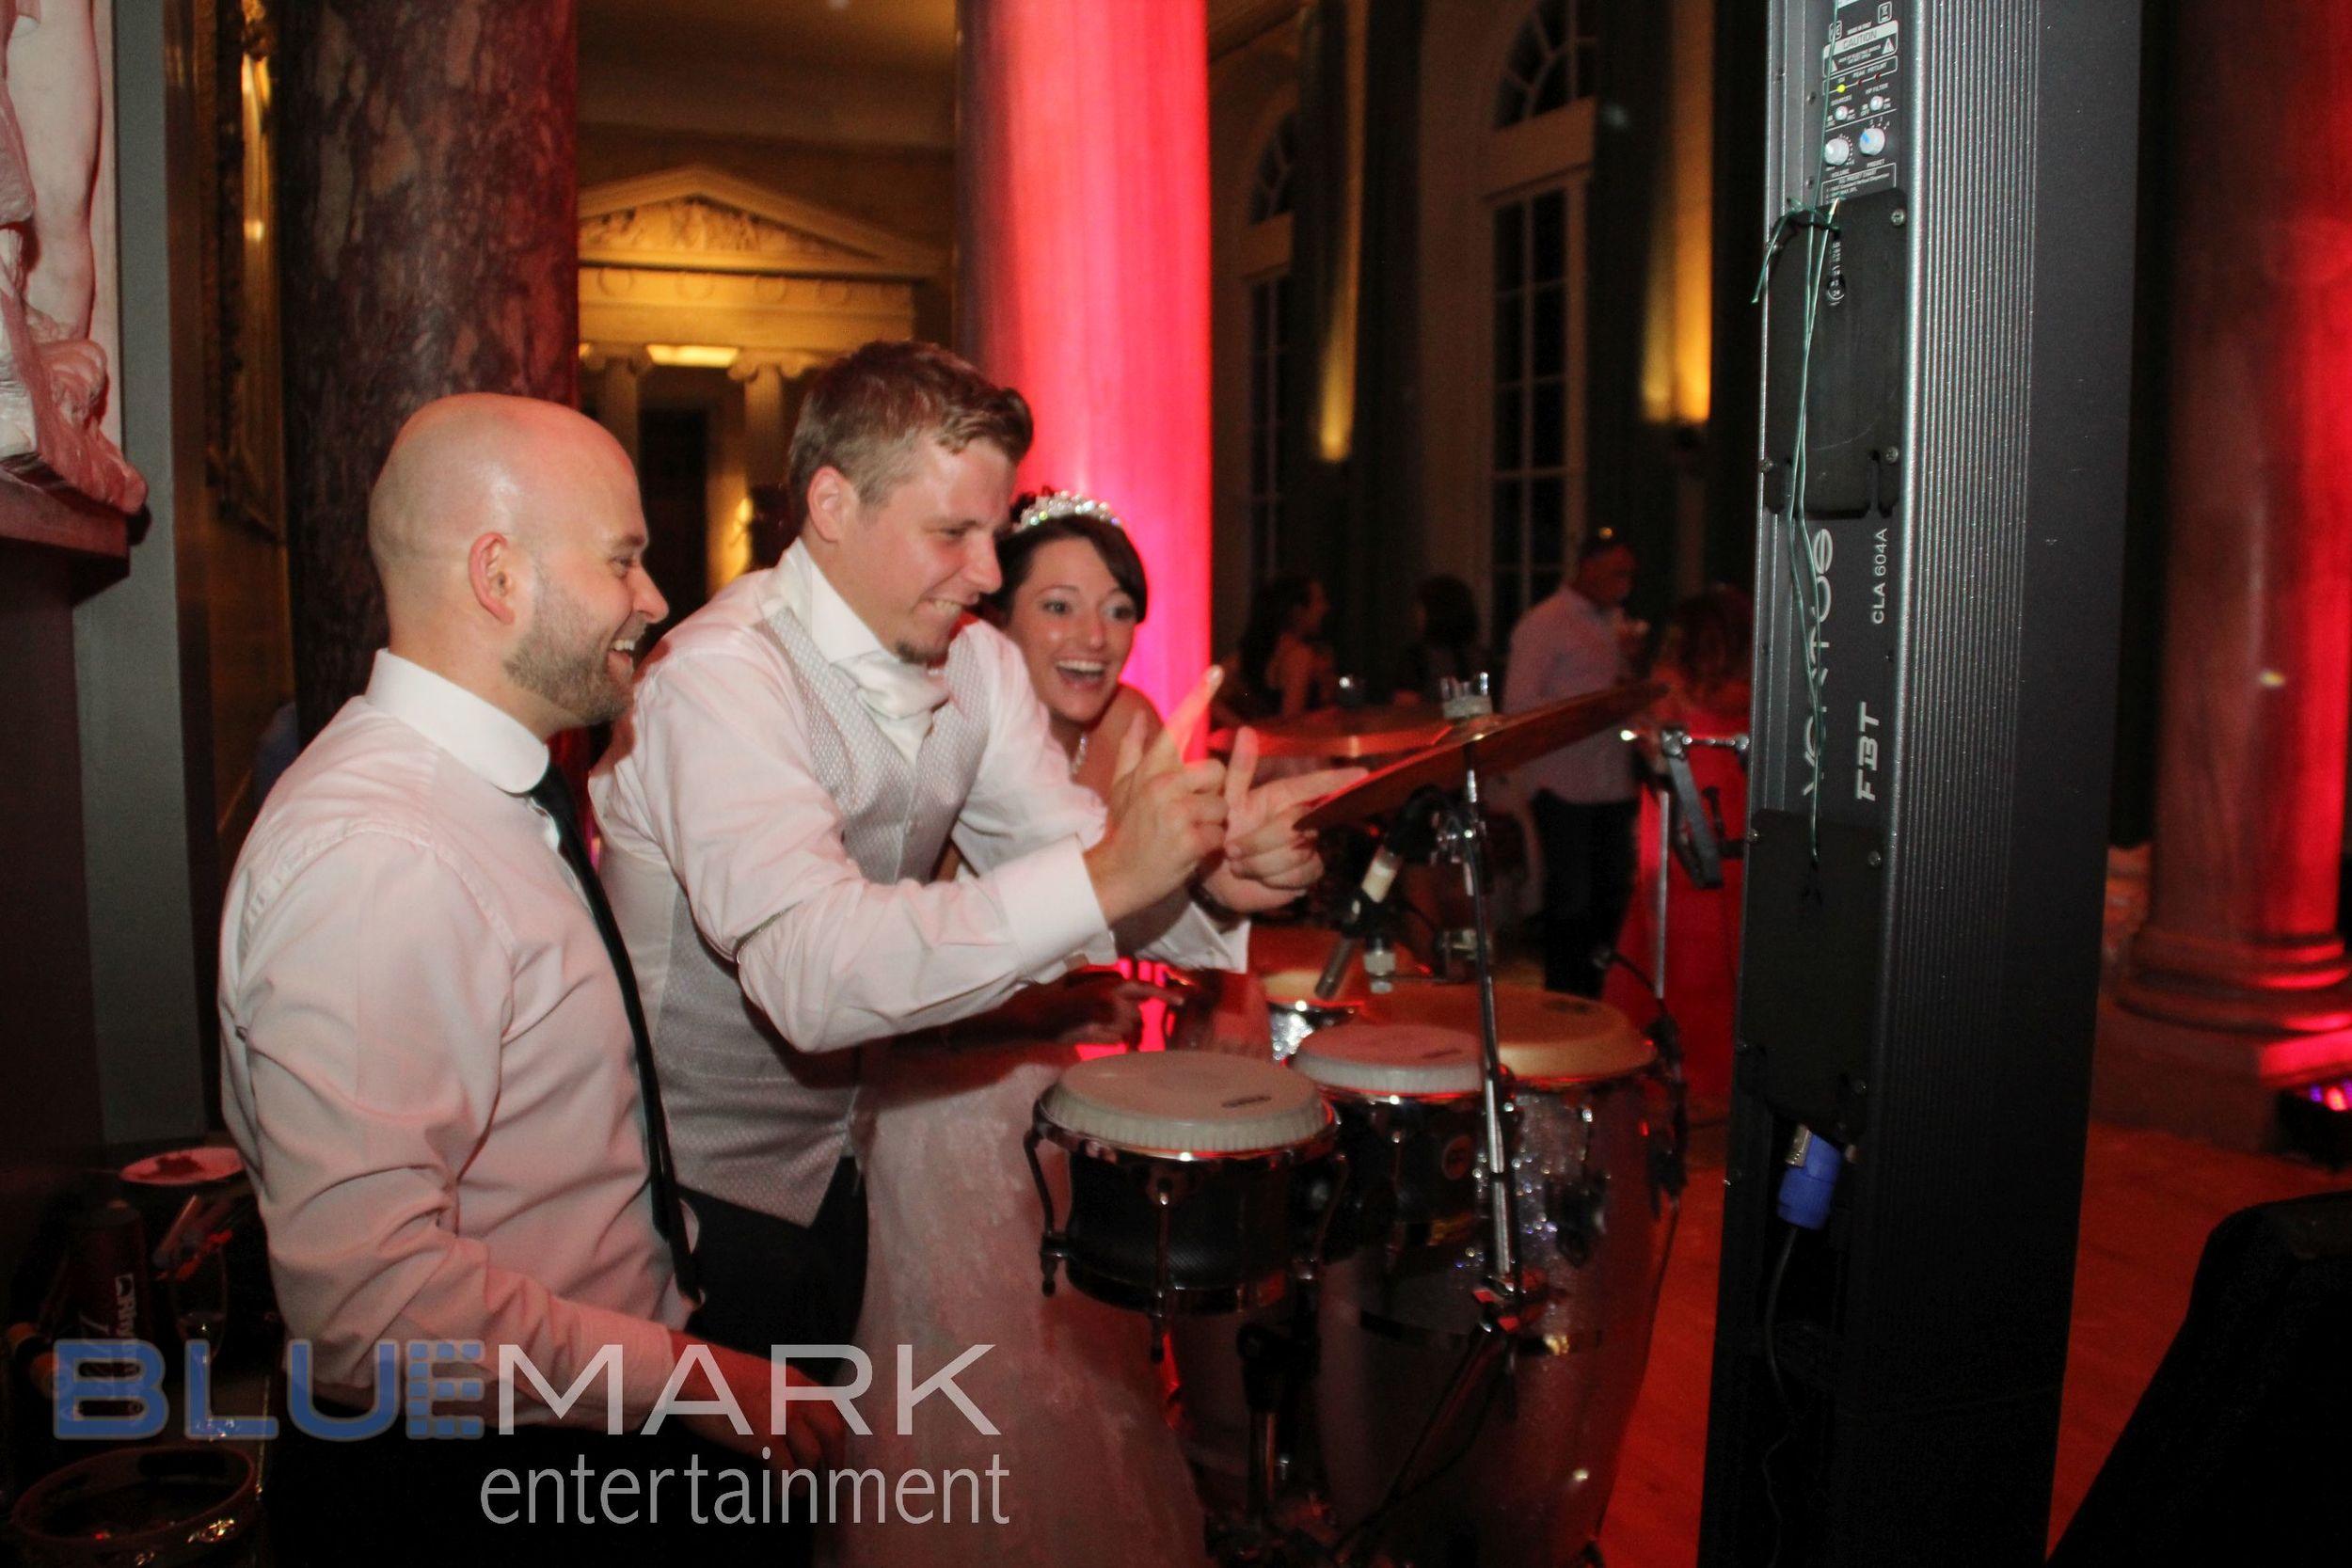 Bluemark_percussionist IMG_9068.jpg